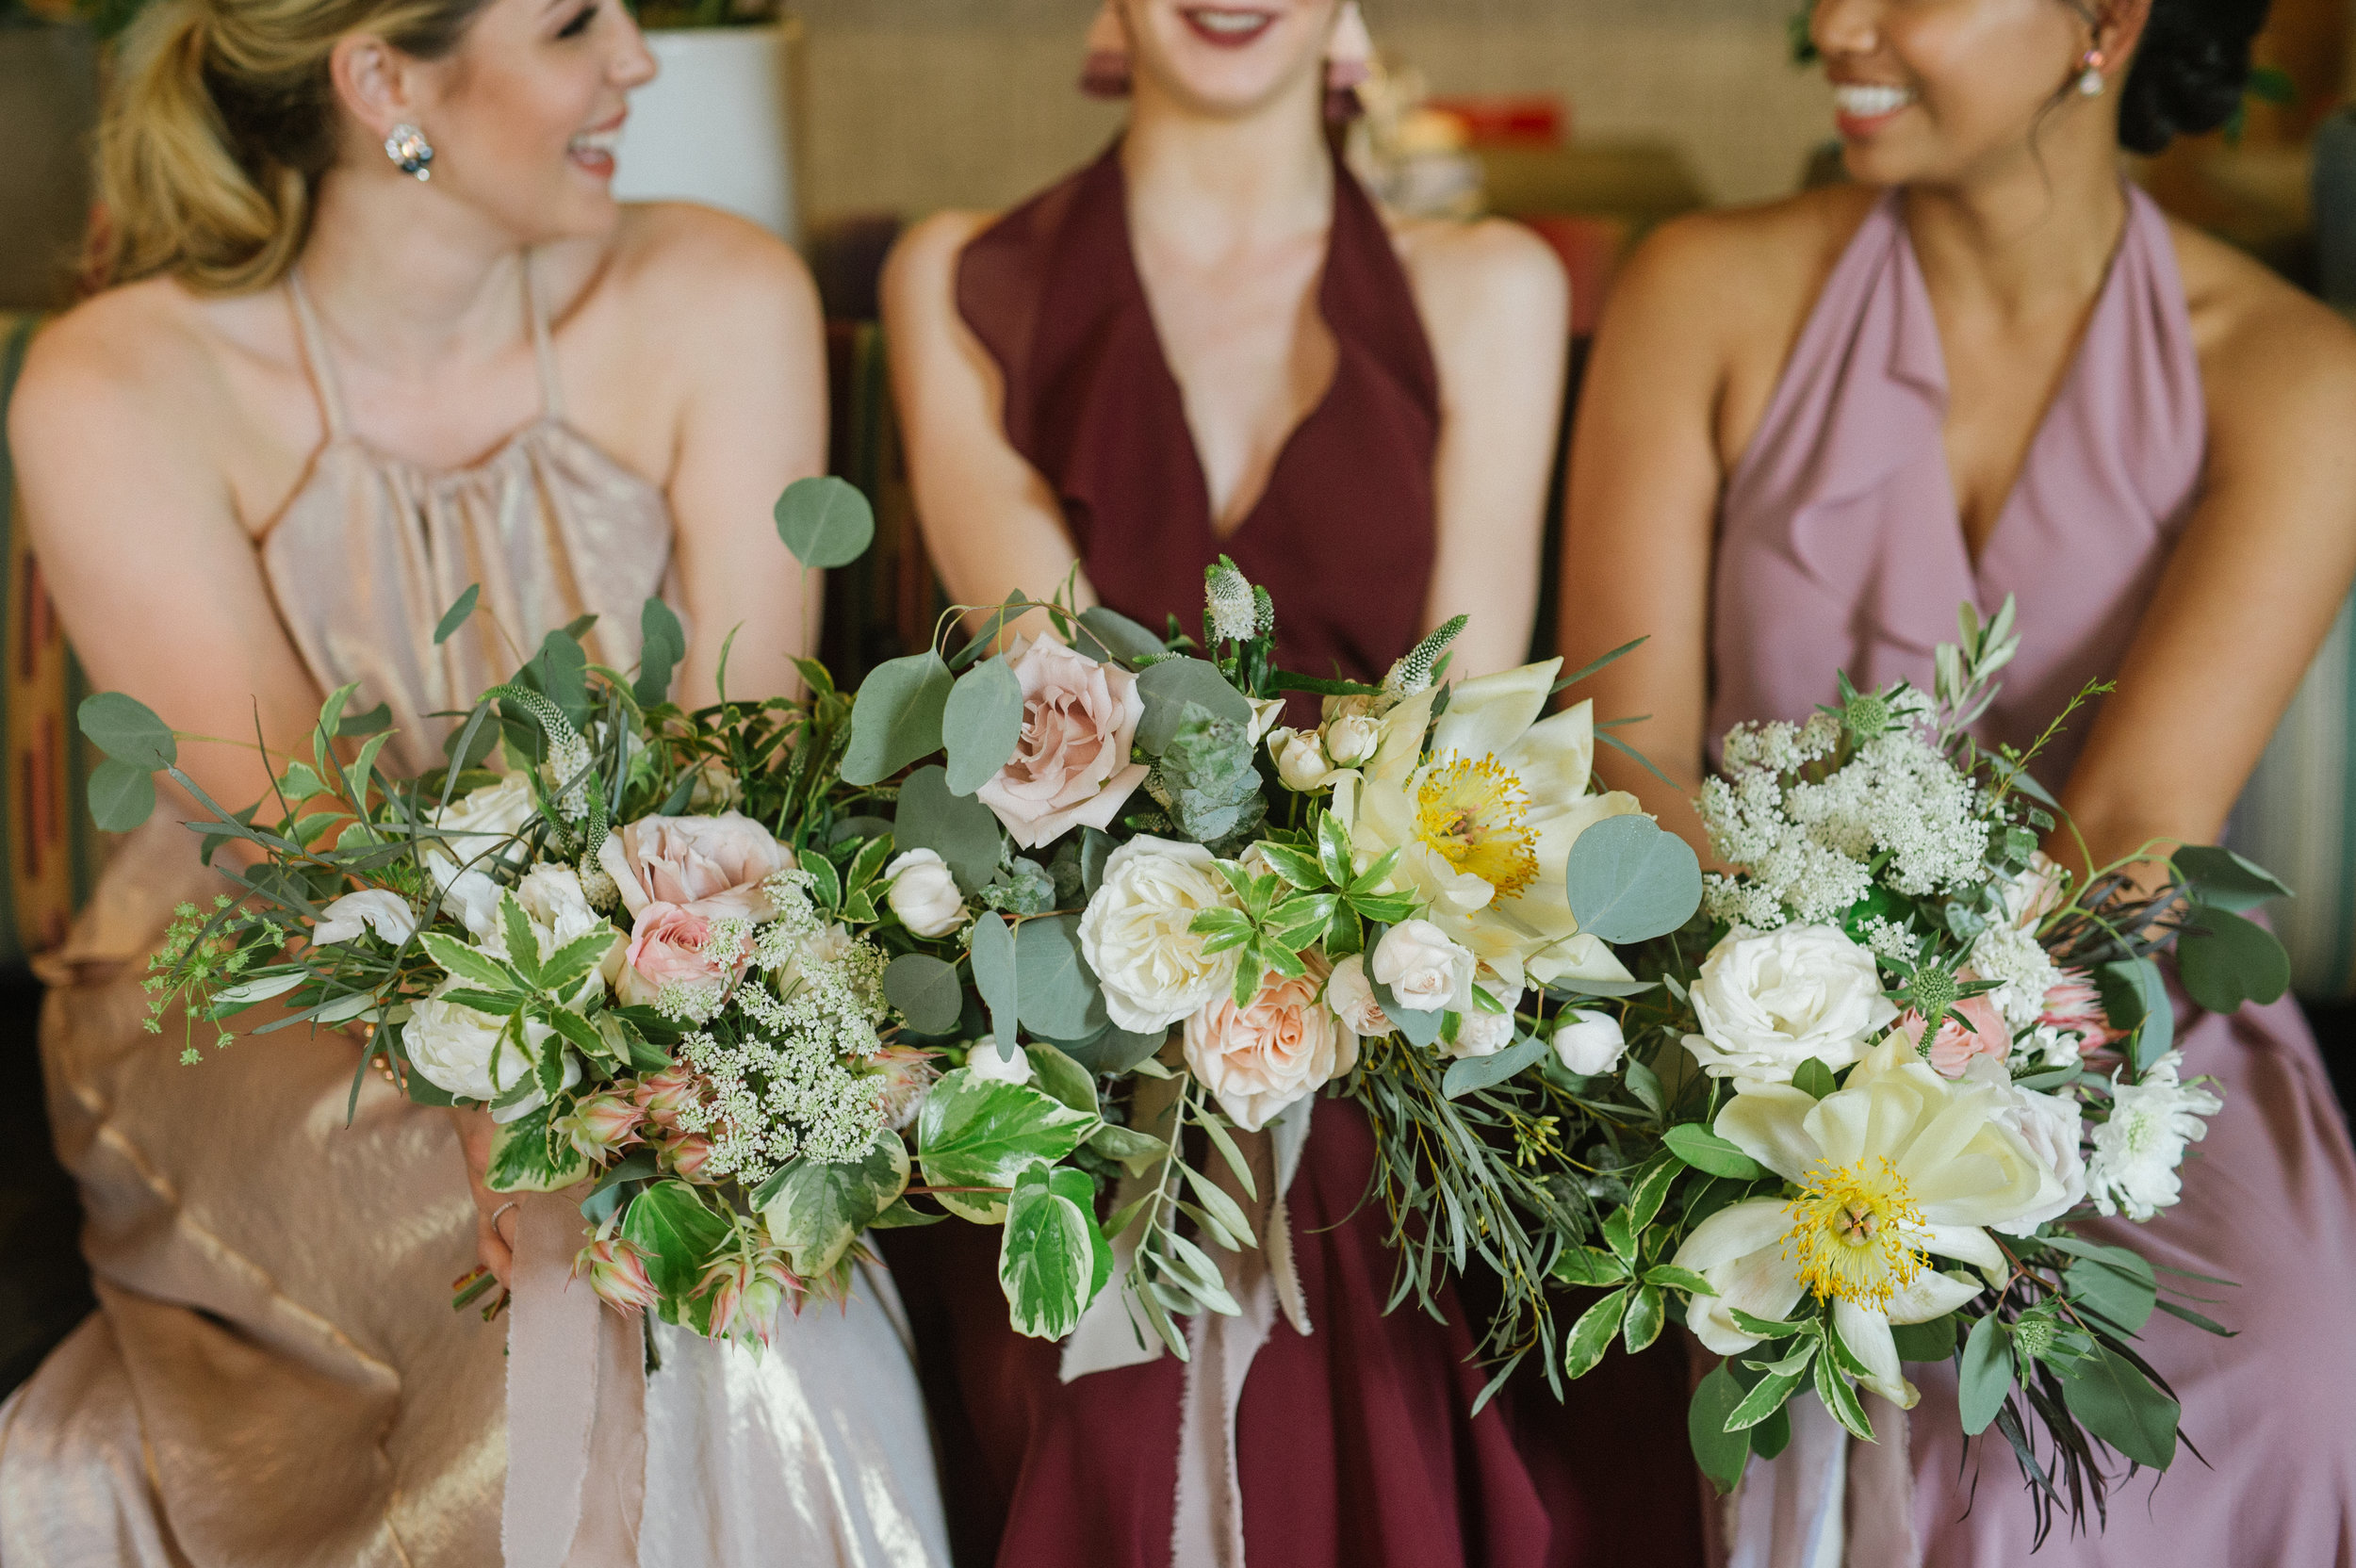 Calgary_Wedding_Photography_Bridgette_Bar_Bridesmaids_Shoot_2018_HR034.jpg